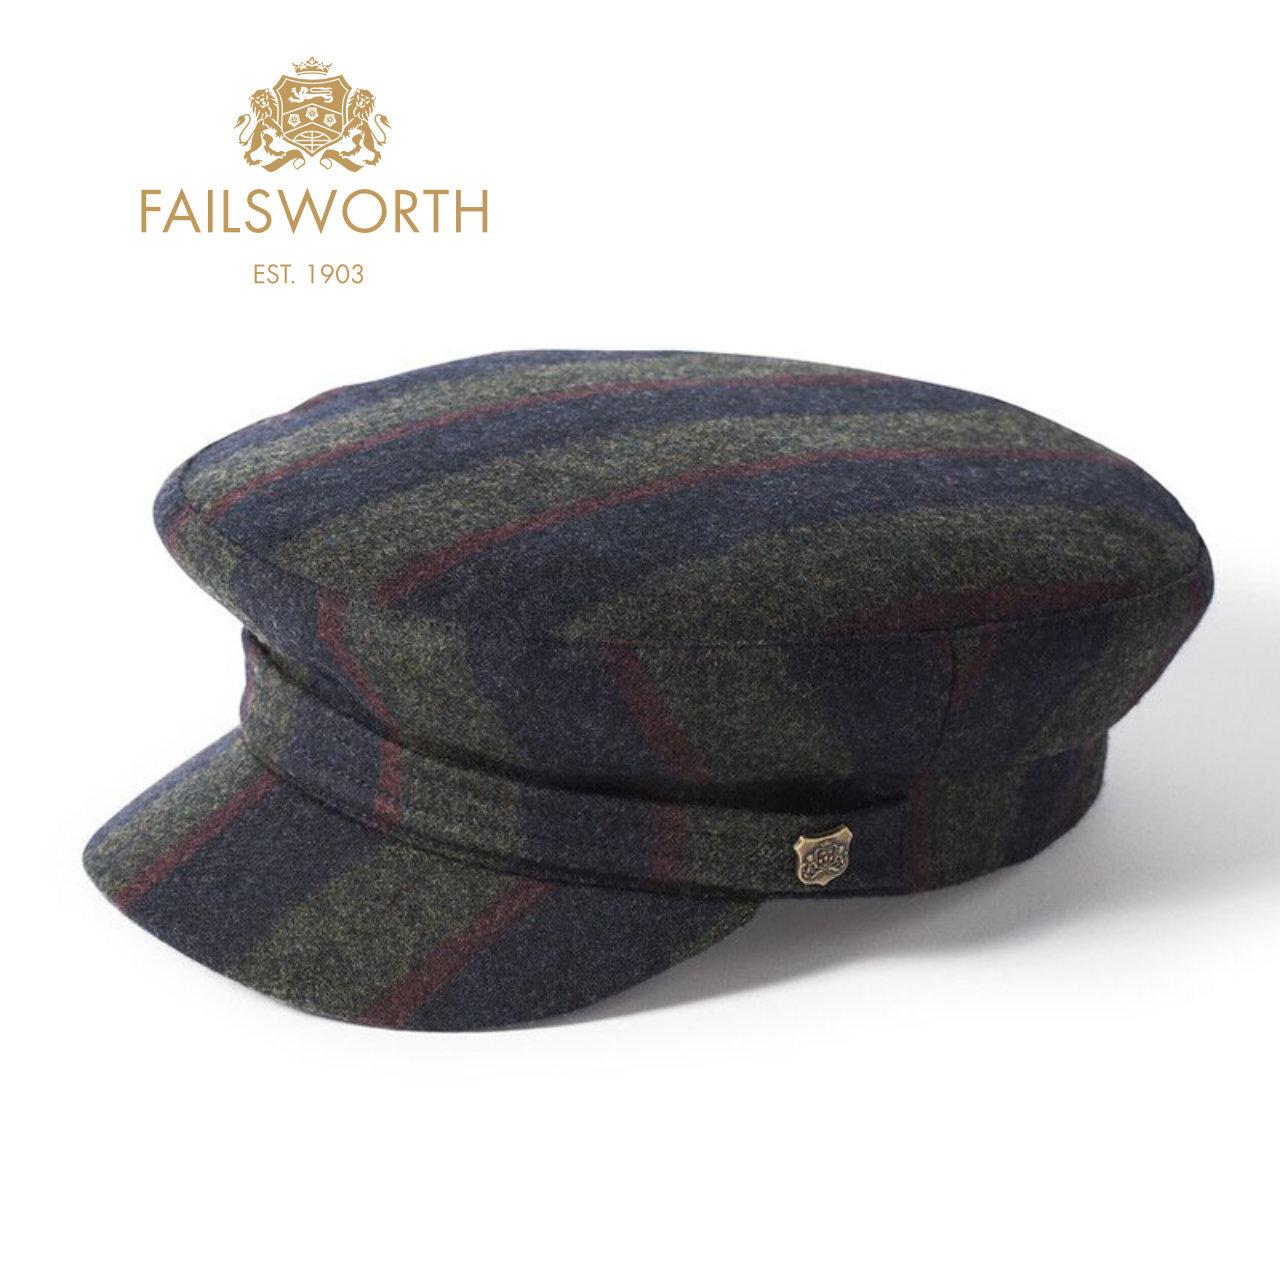 【FAILSWORTH】 英国マラリウス製生地使用 ストライプ マリンキャップ 〈Grey〉